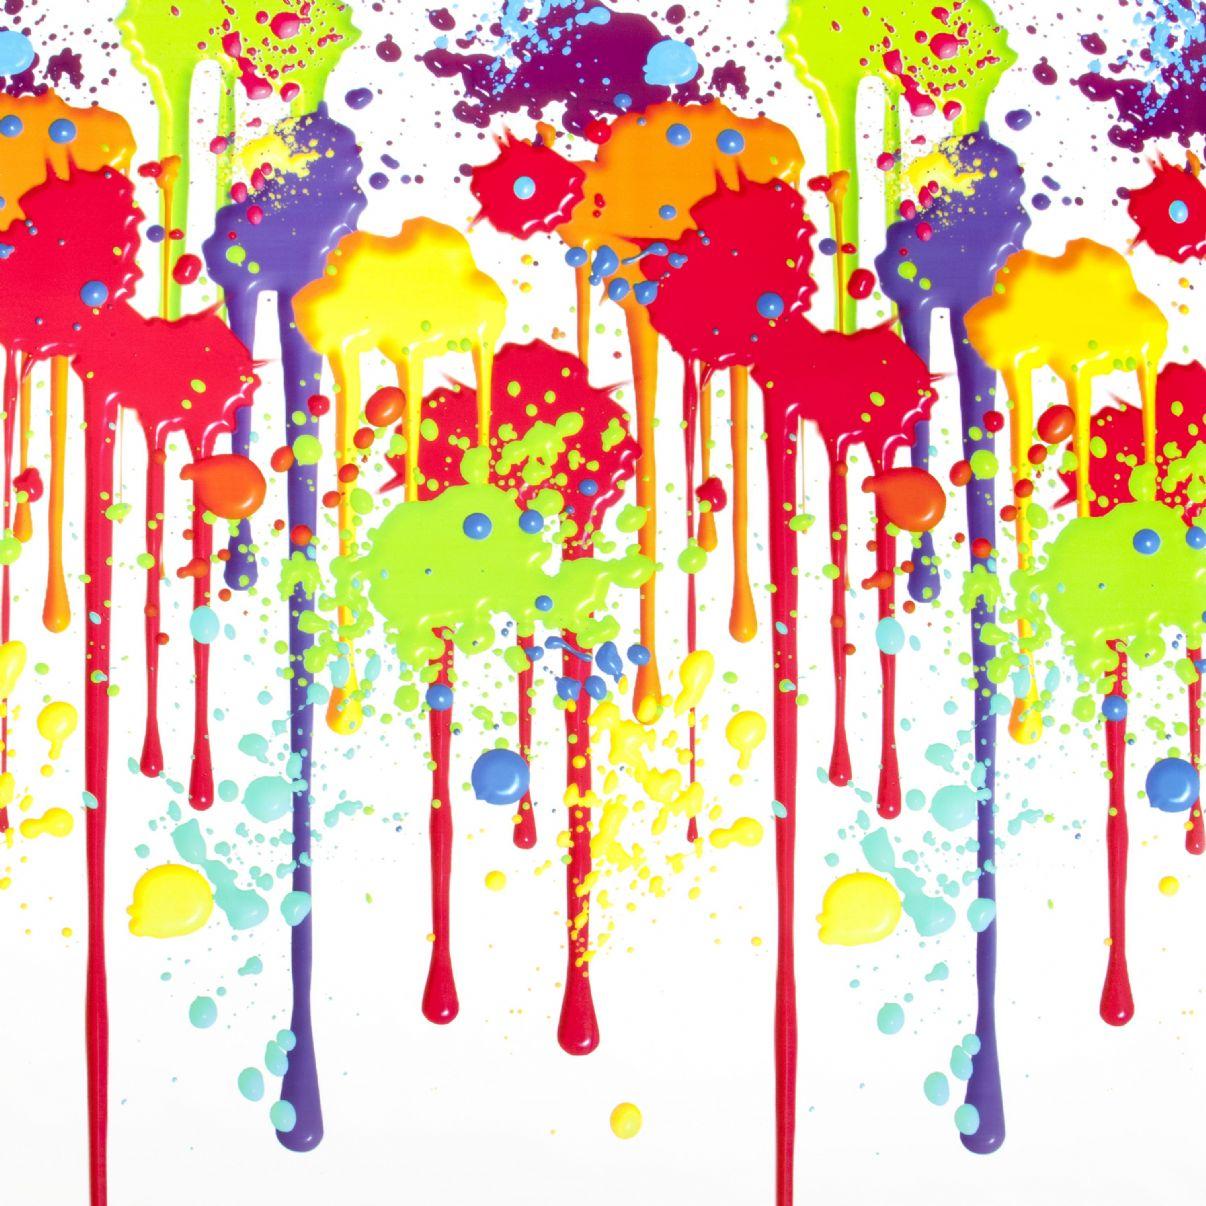 Splatter clipart spilled paint Splatters Spill Download Clip Free